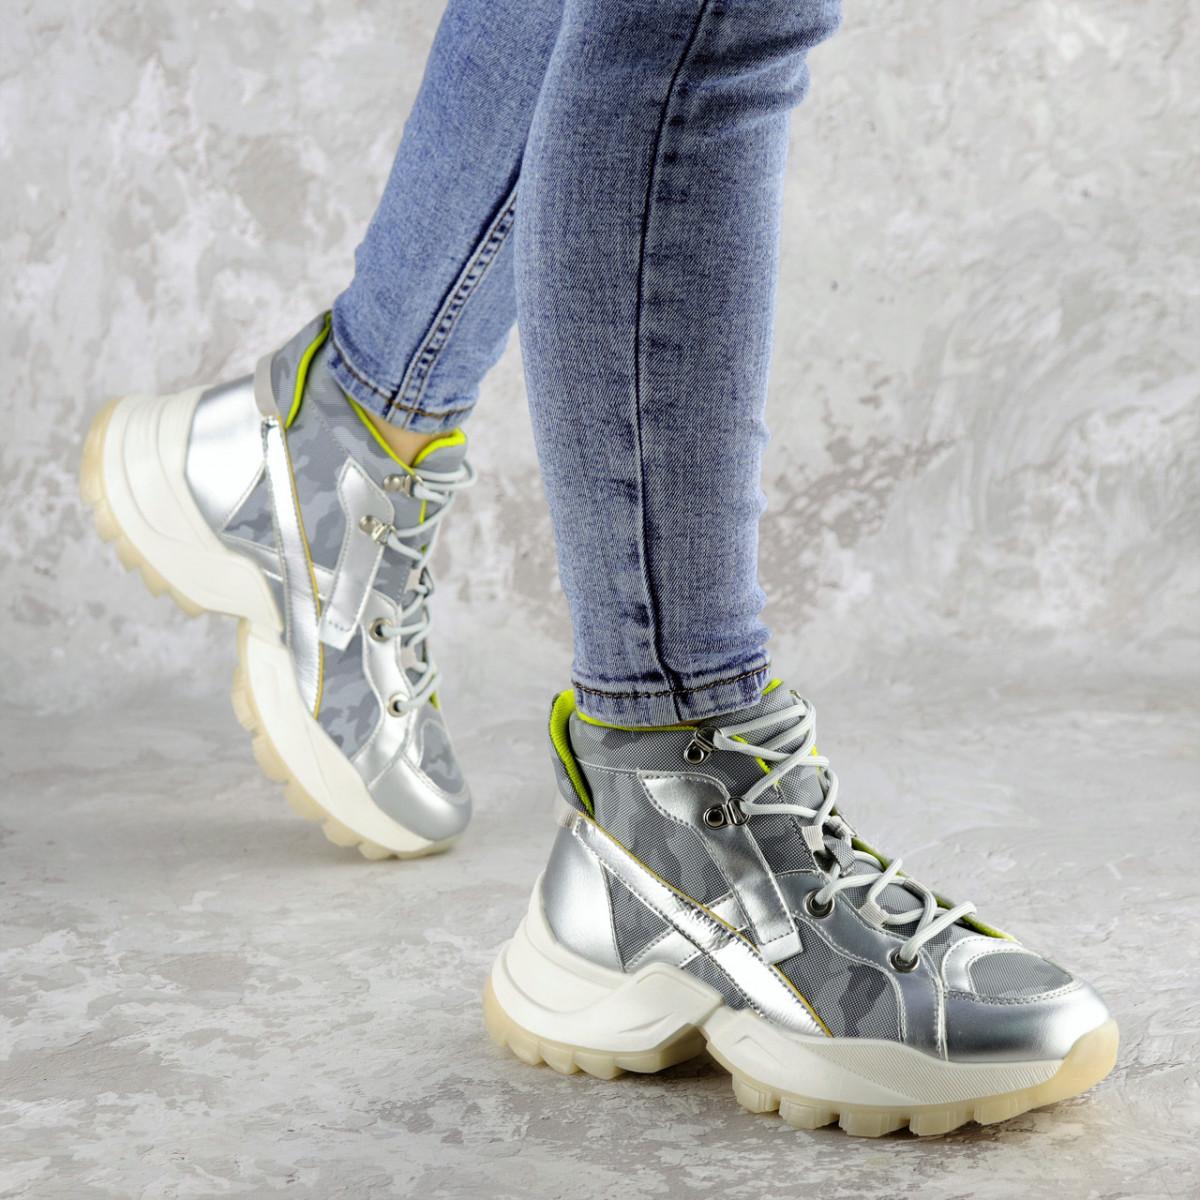 Ботинки женские серебристые Rowan 2395 (36 размер)